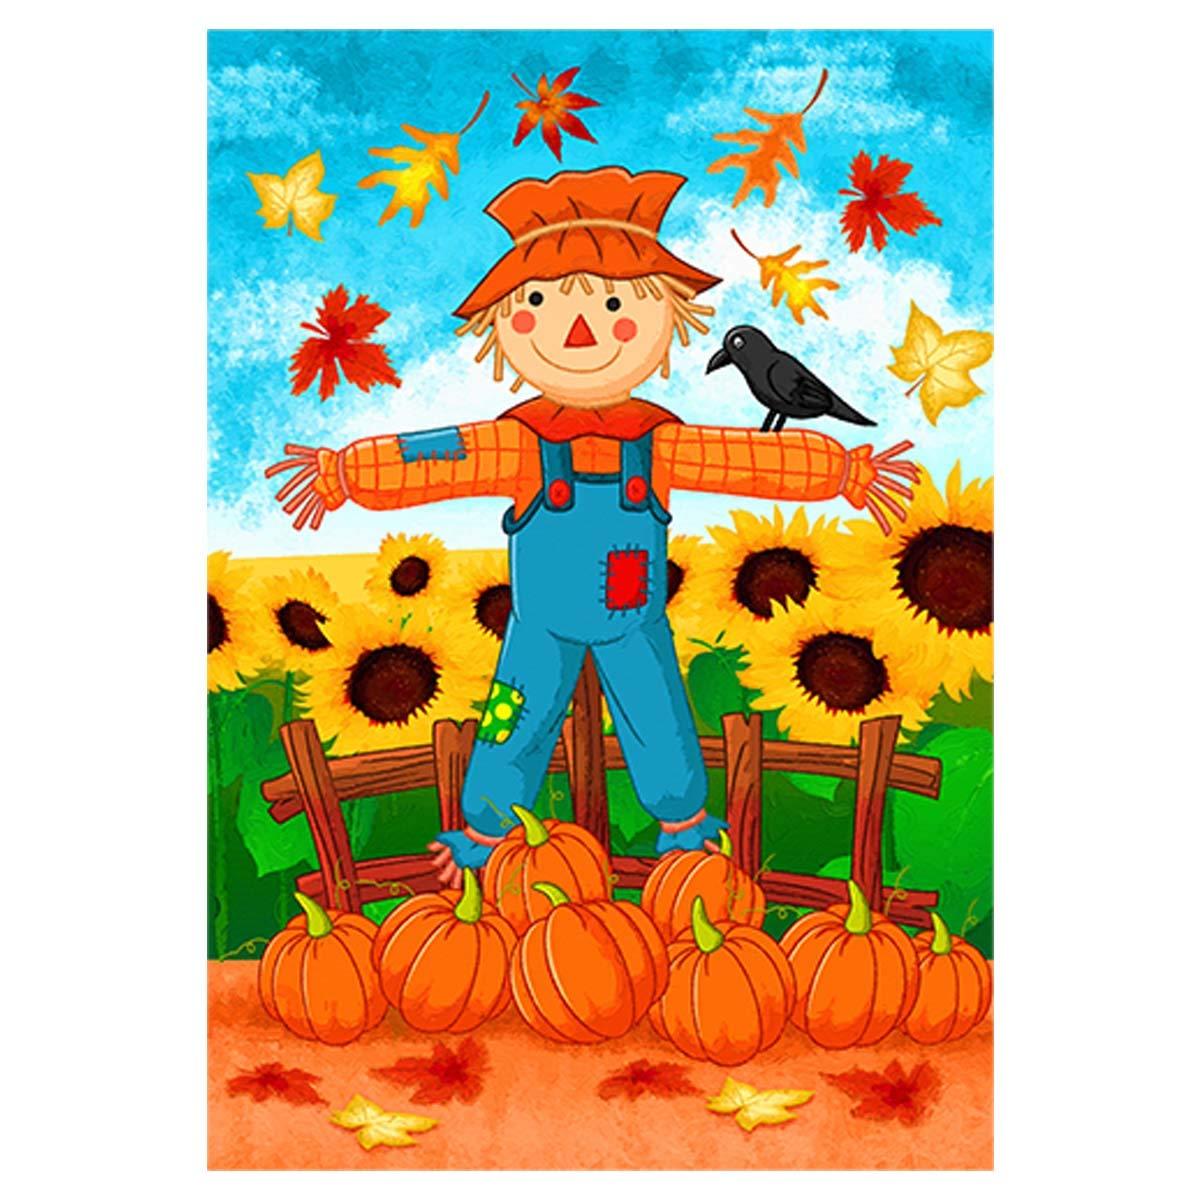 Morigins Fall Y'all Scarecrow Harvest Flag Autumn Sunflower Garden Flag Double Sided 12.5 x 18 Inch